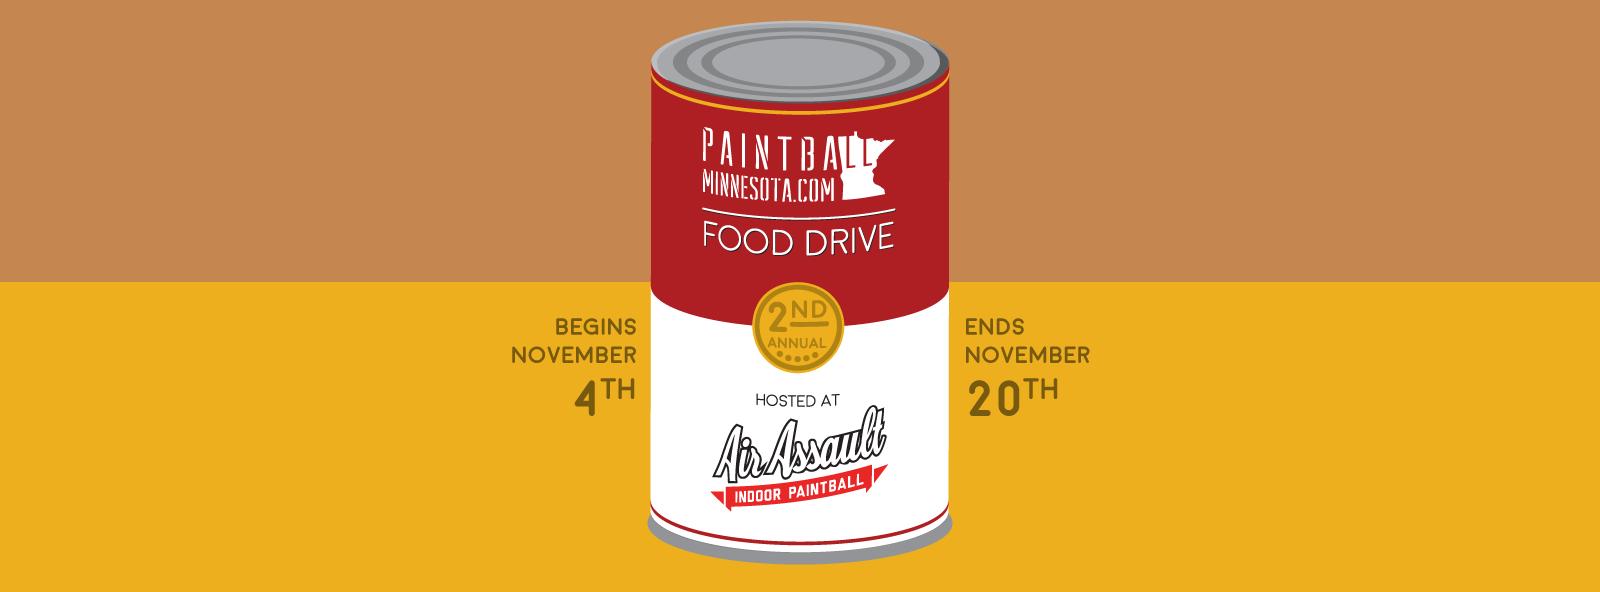 paintball minnesota food drive